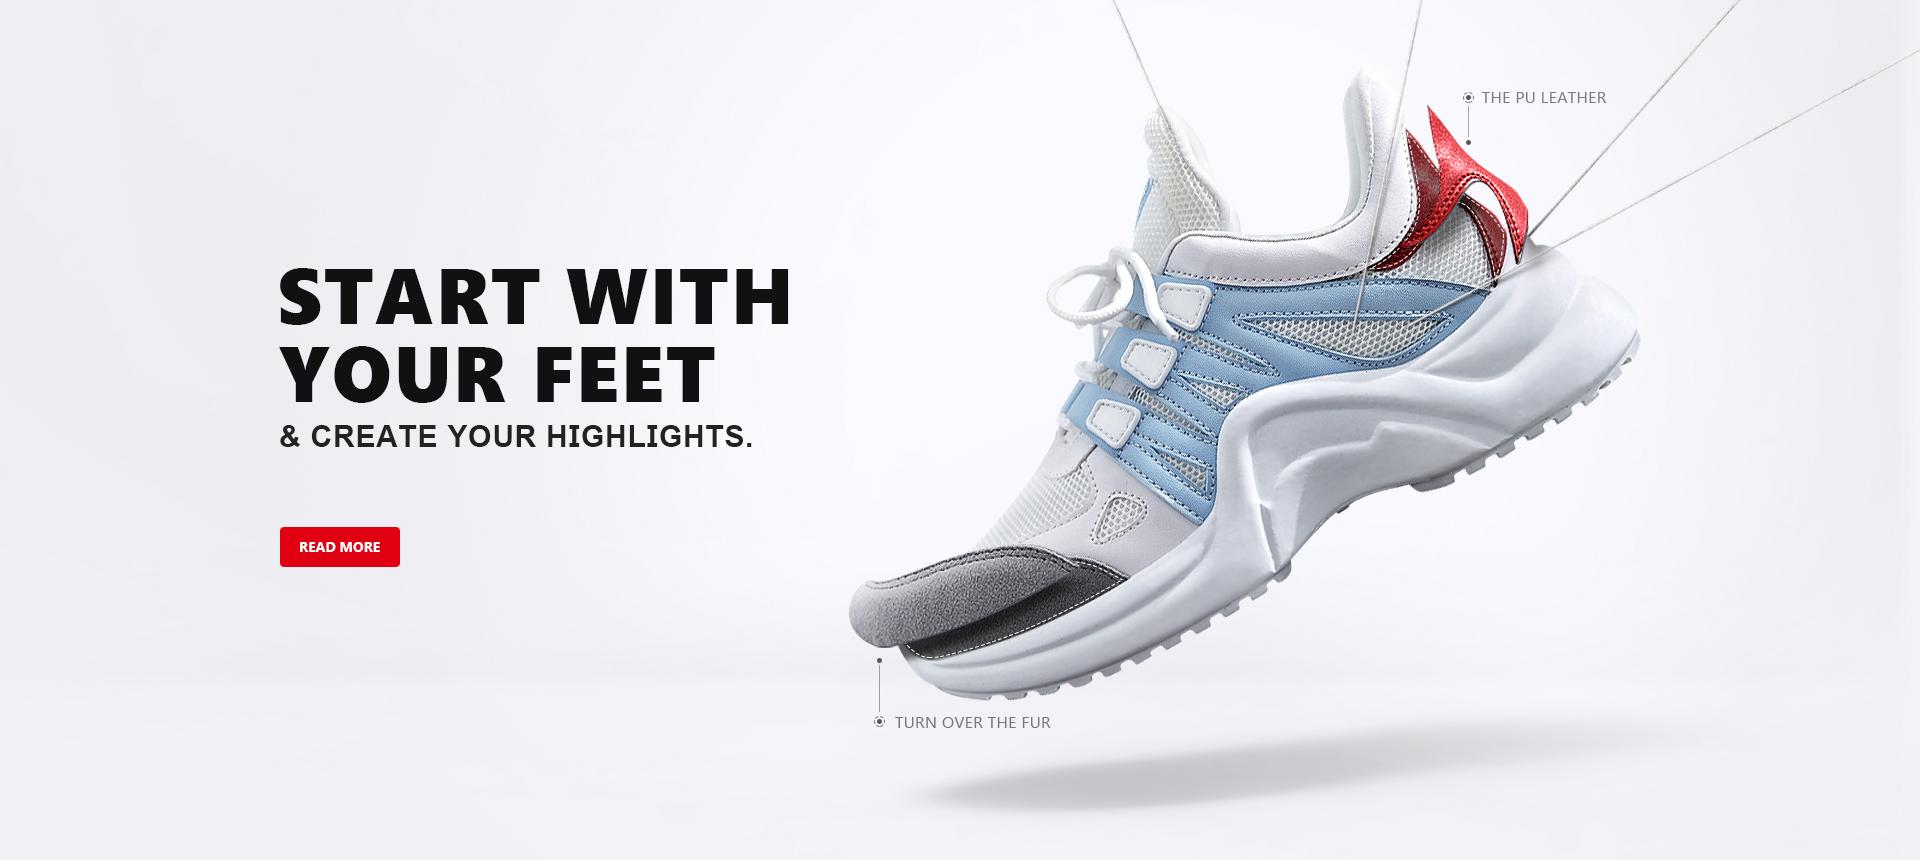 Custom Made Shoe Factory, Wholesale